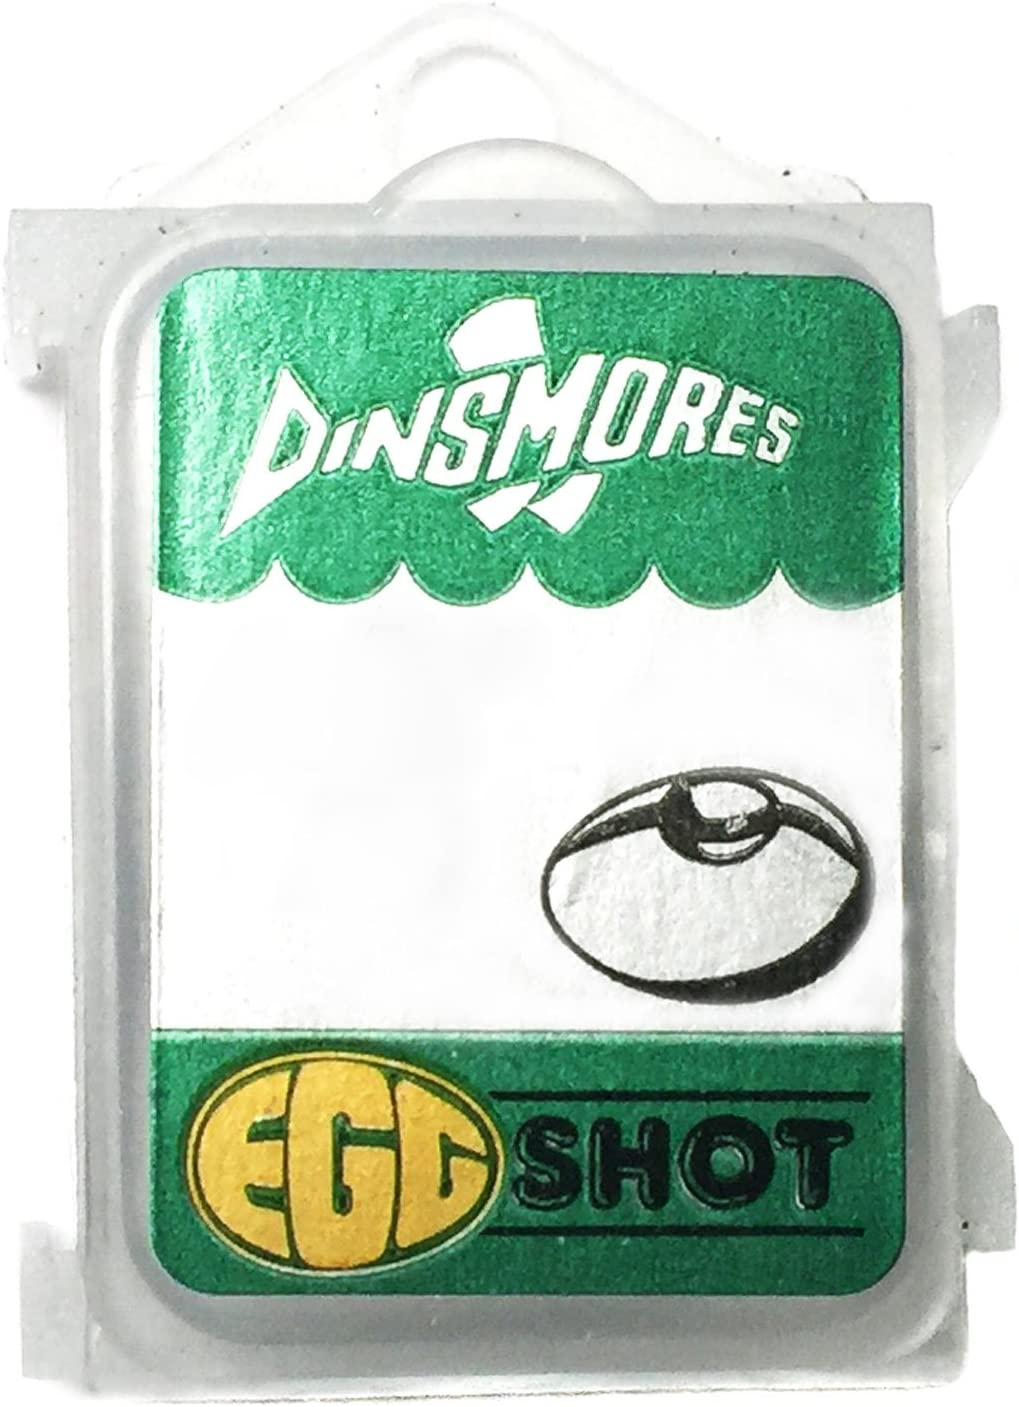 Dinsmores Egg sale Rapid rise Shot - Refill